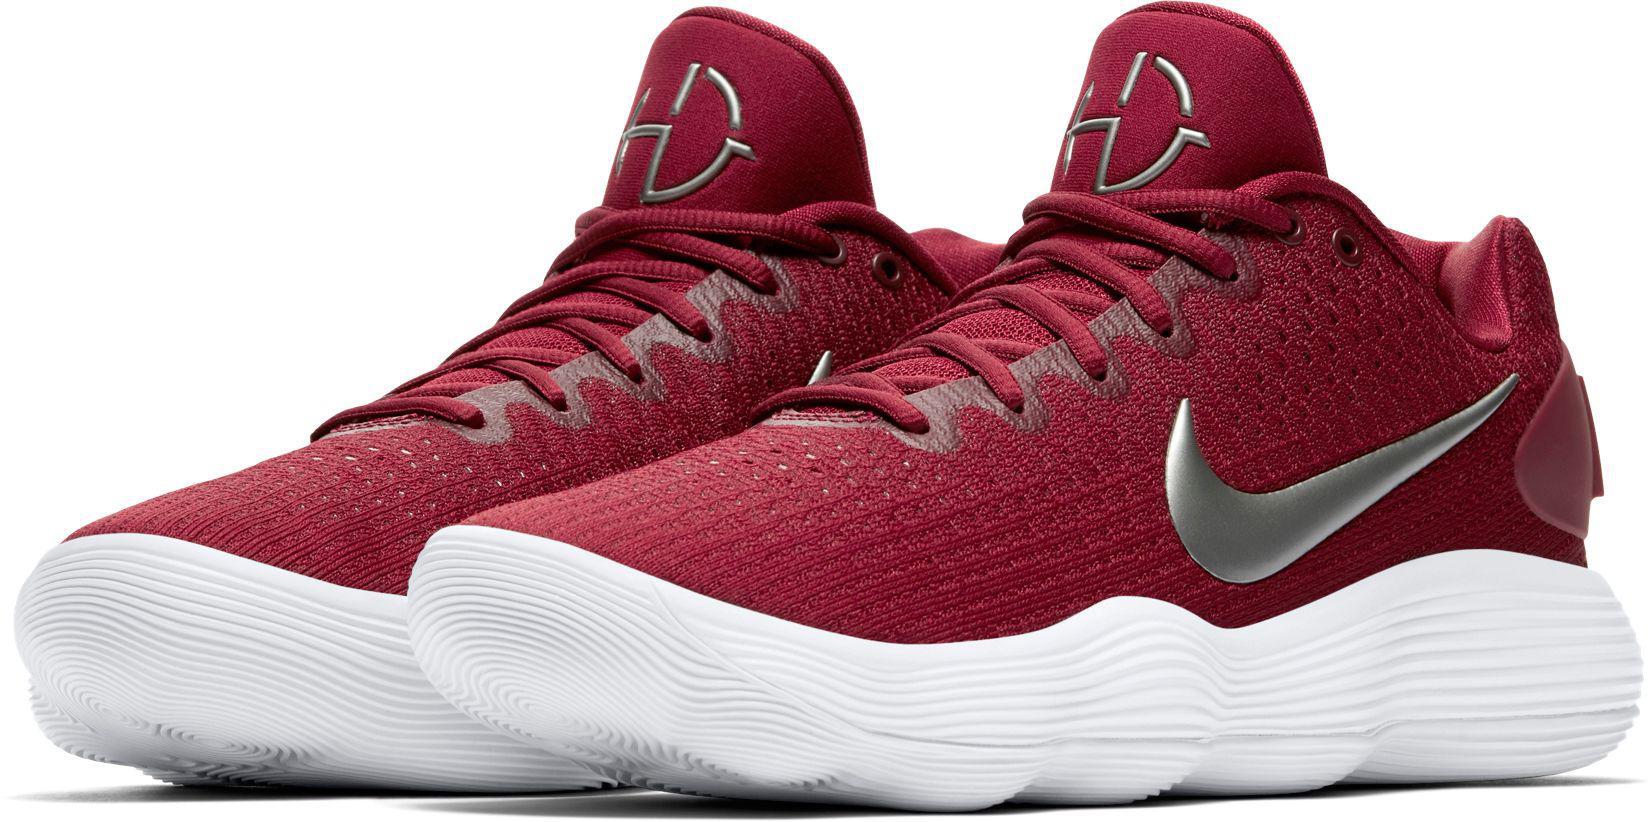 15c322177d7 Nike - Multicolor React Hyperdunk 2017 Low Basketball Shoes - Lyst